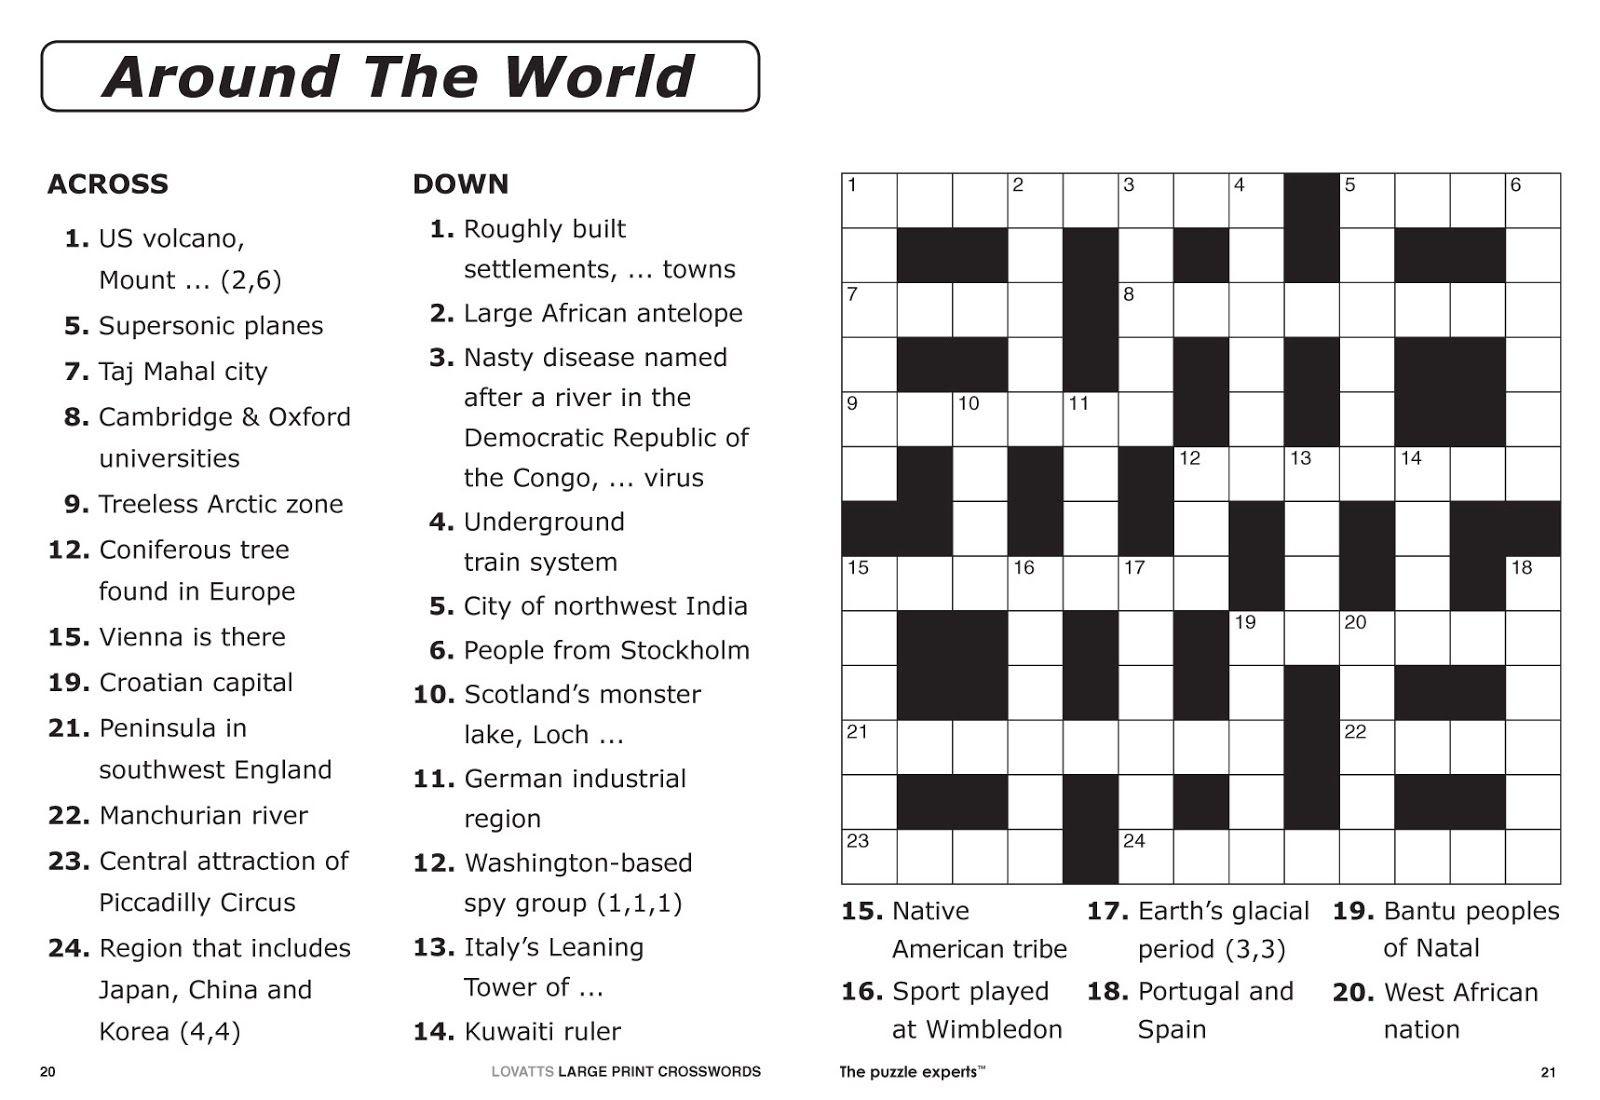 Free Printable Large Print Crossword Puzzles | M3U8 - Printable Crosswords For 13 Year Olds